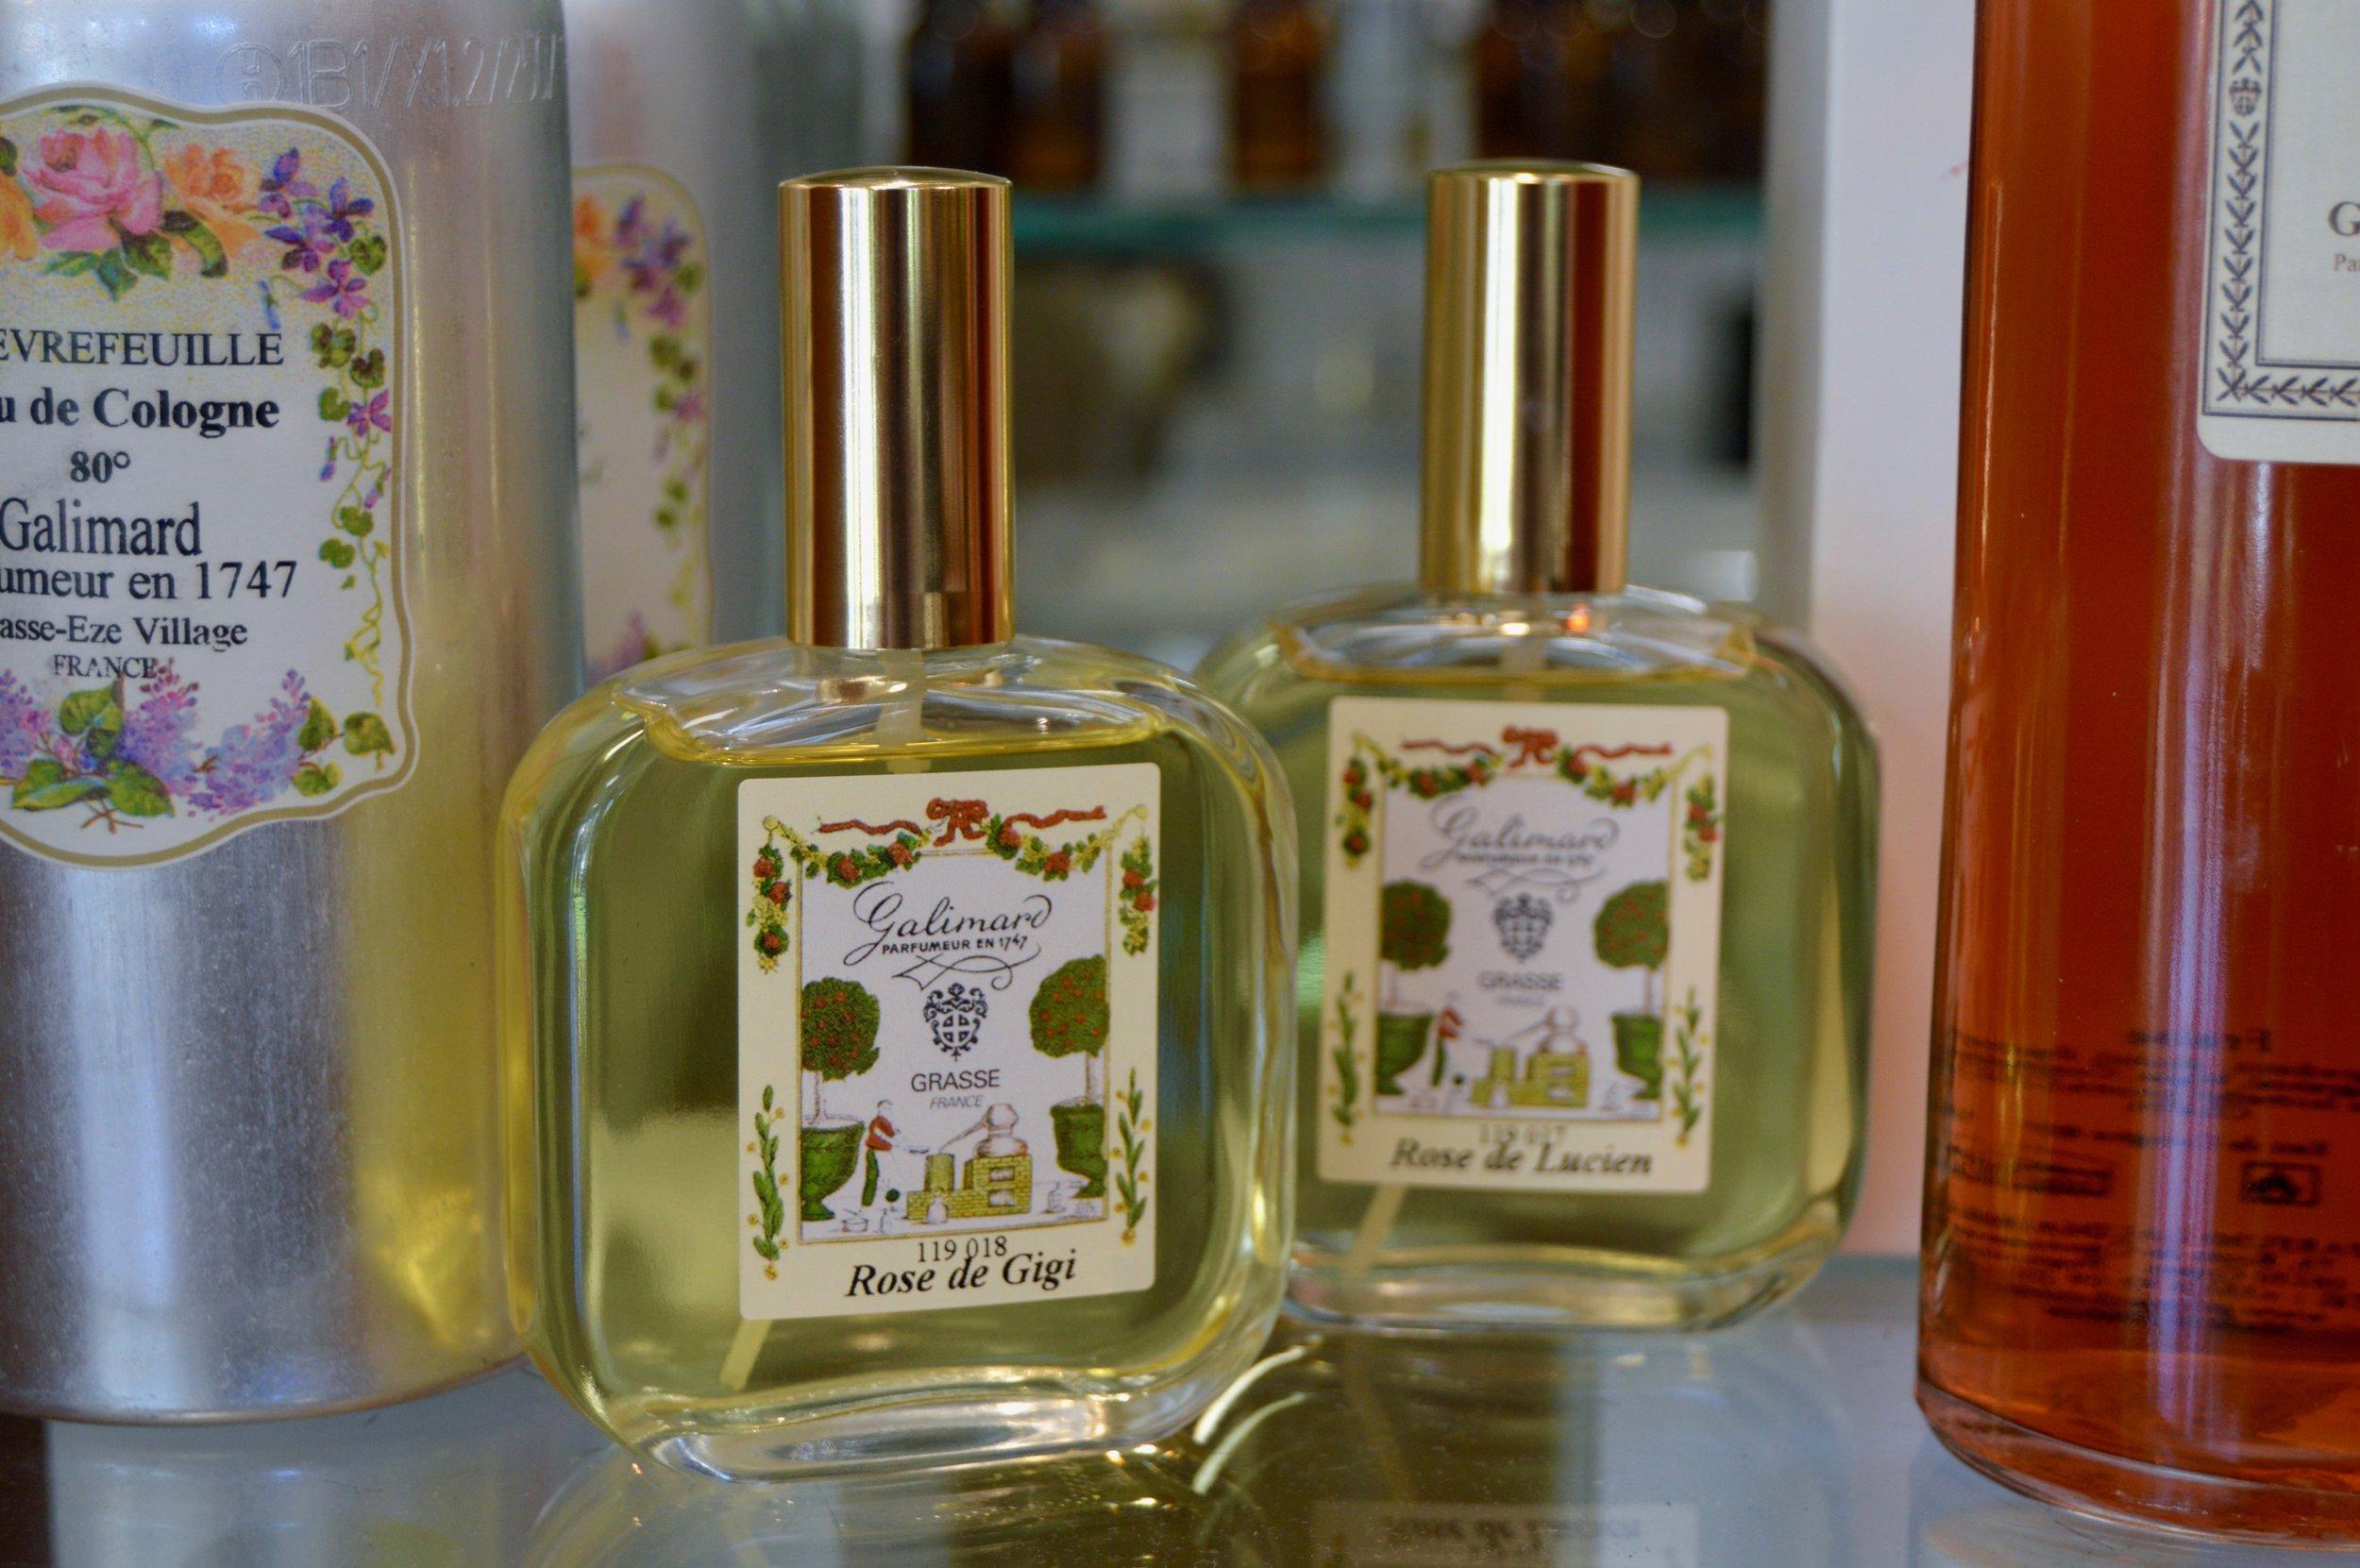 Our personal perfumes: Rose de Gigi and Rose de Lucien